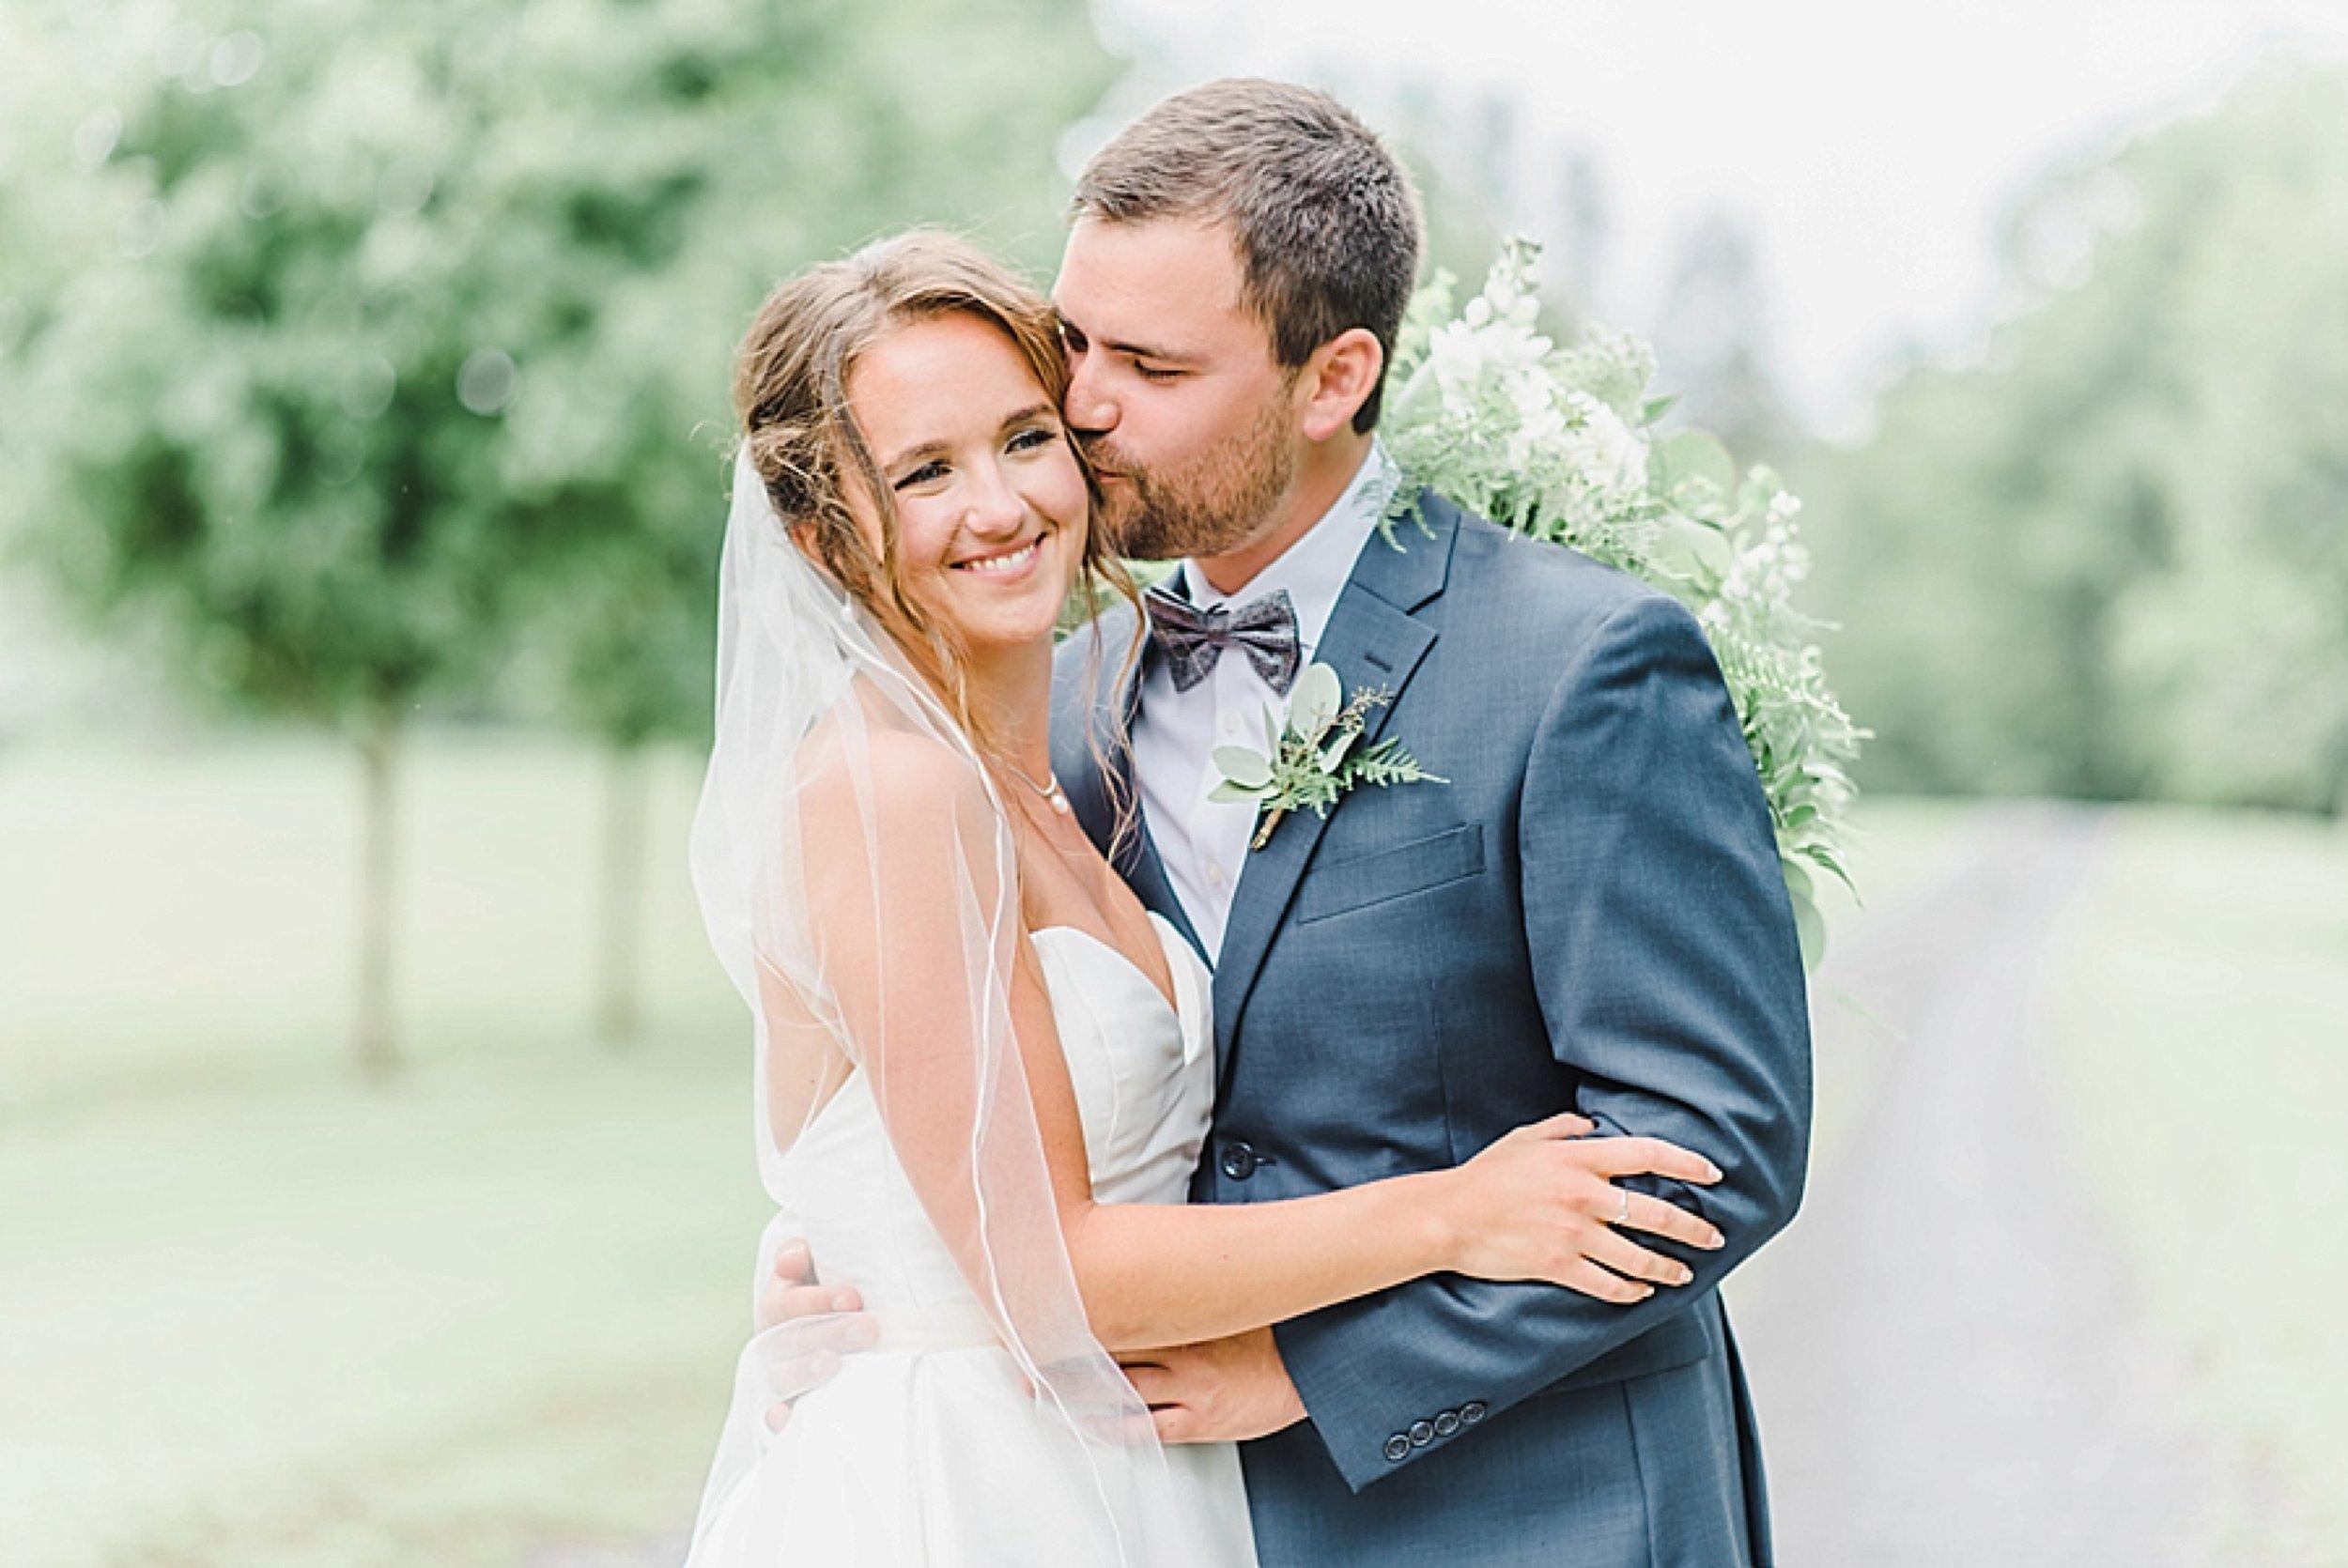 light airy indie fine art ottawa wedding photographer | Ali and Batoul Photography_0491.jpg